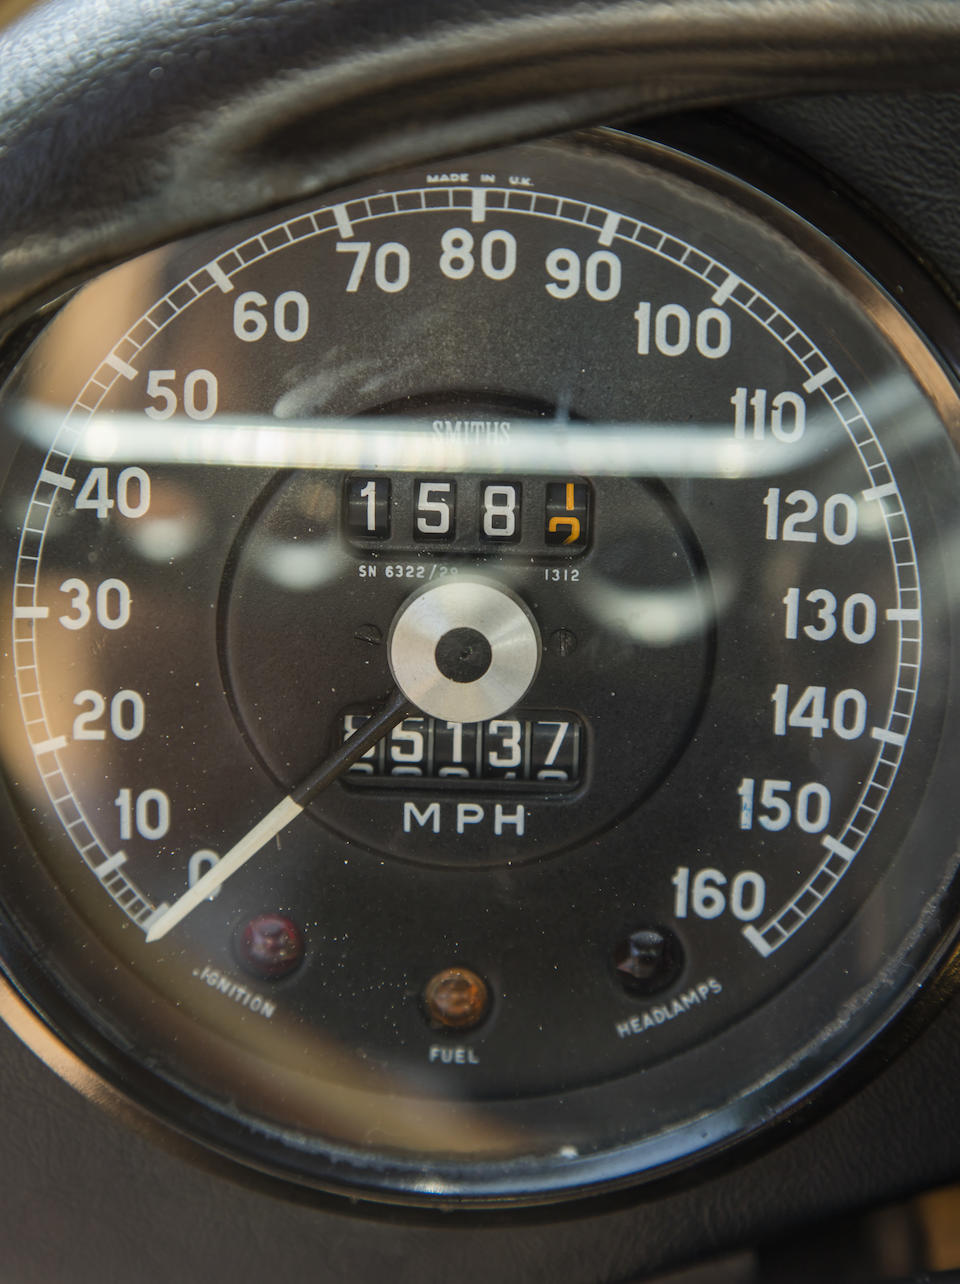 <b>1966 JAGUAR E-TYPE SERIES I 4.2 FIXED HEAD COUPE</b><br />  Chassis no. 1E33710 <br />Engine no. 7E10728-9